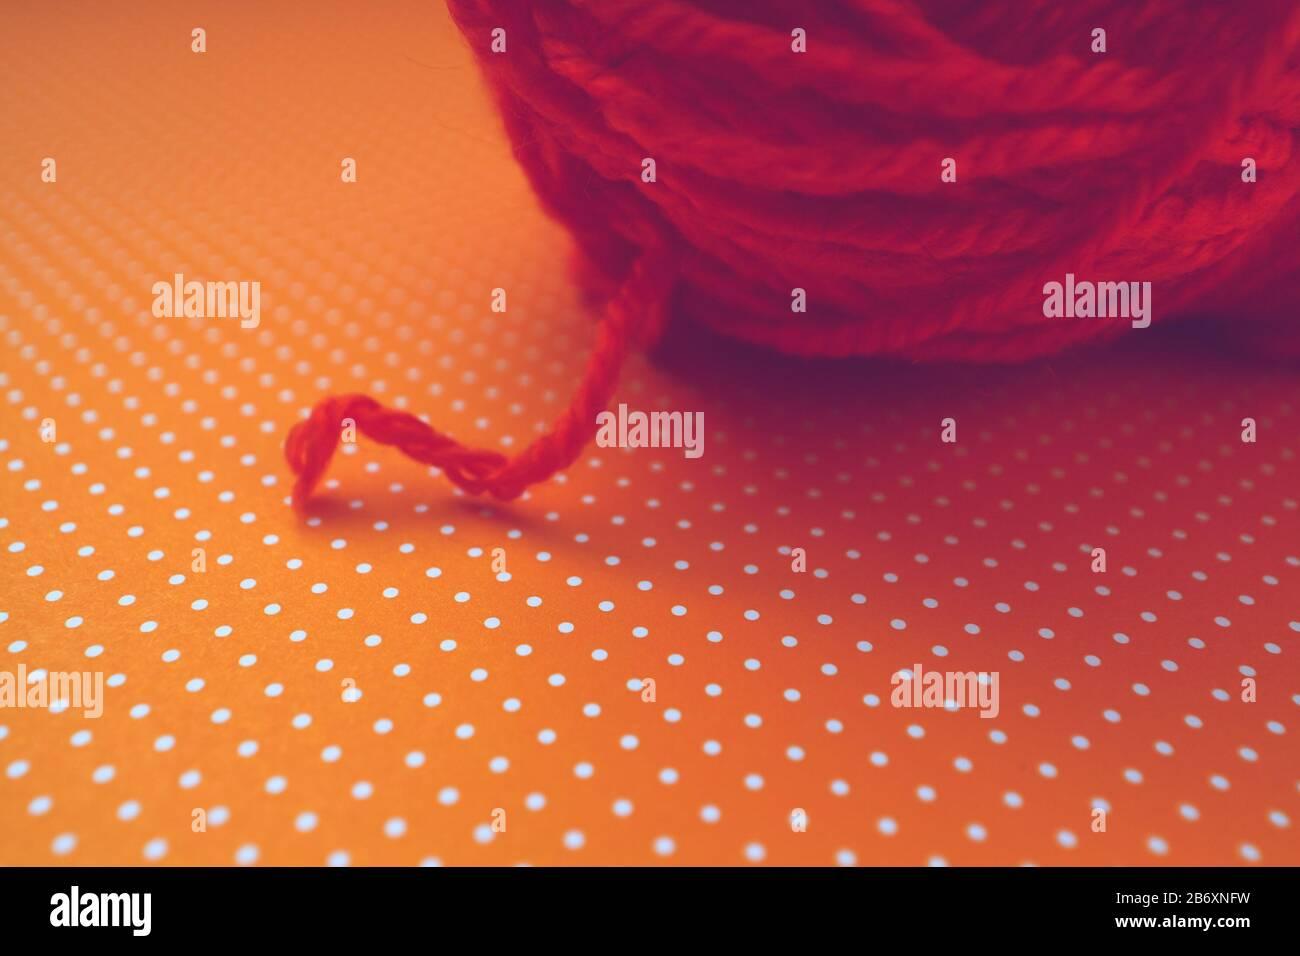 orange-yarn-ball-on-an-orange-dotted-bac